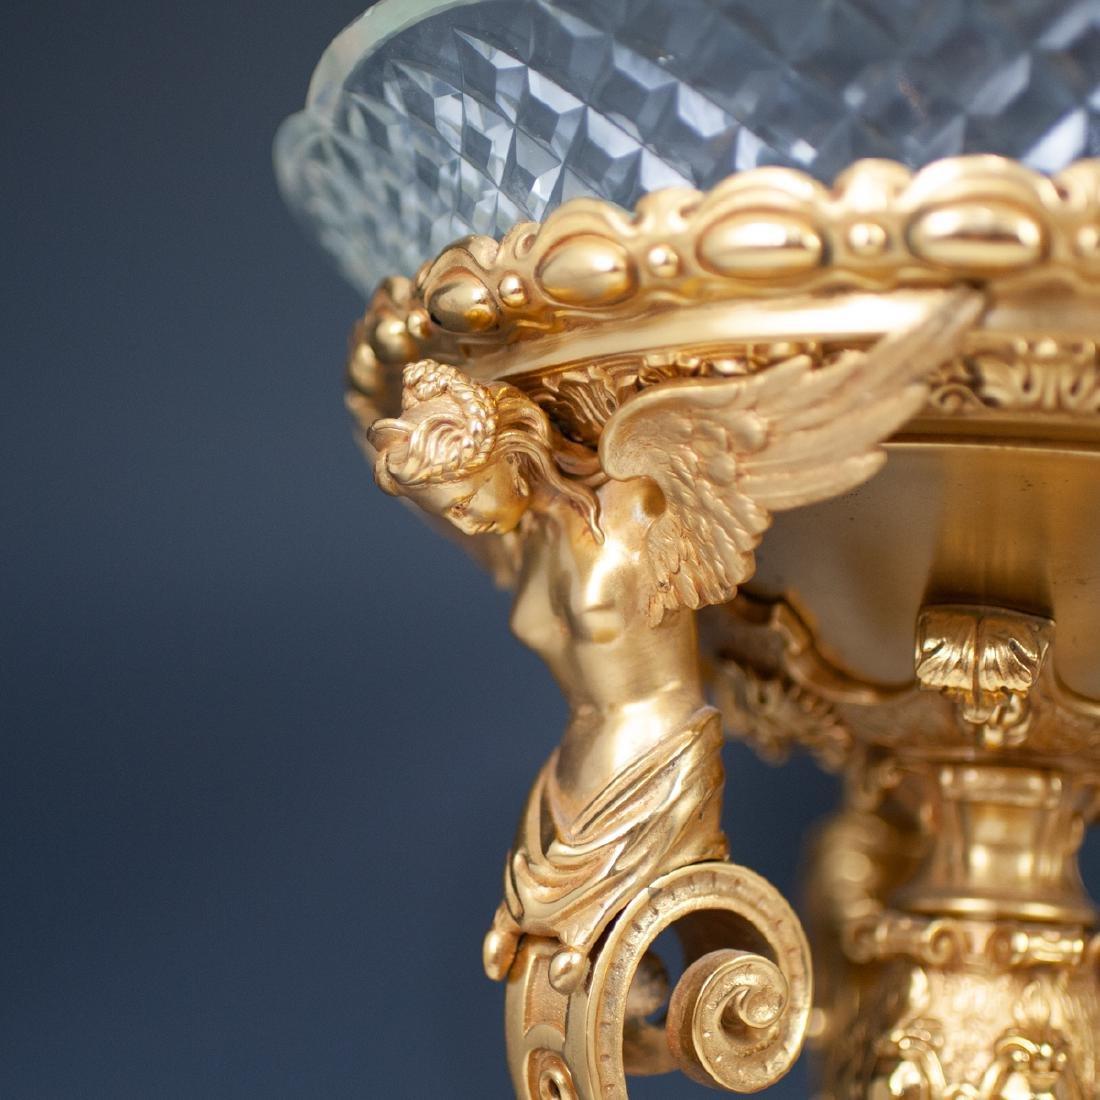 Antique imperial style centerpiece - 9